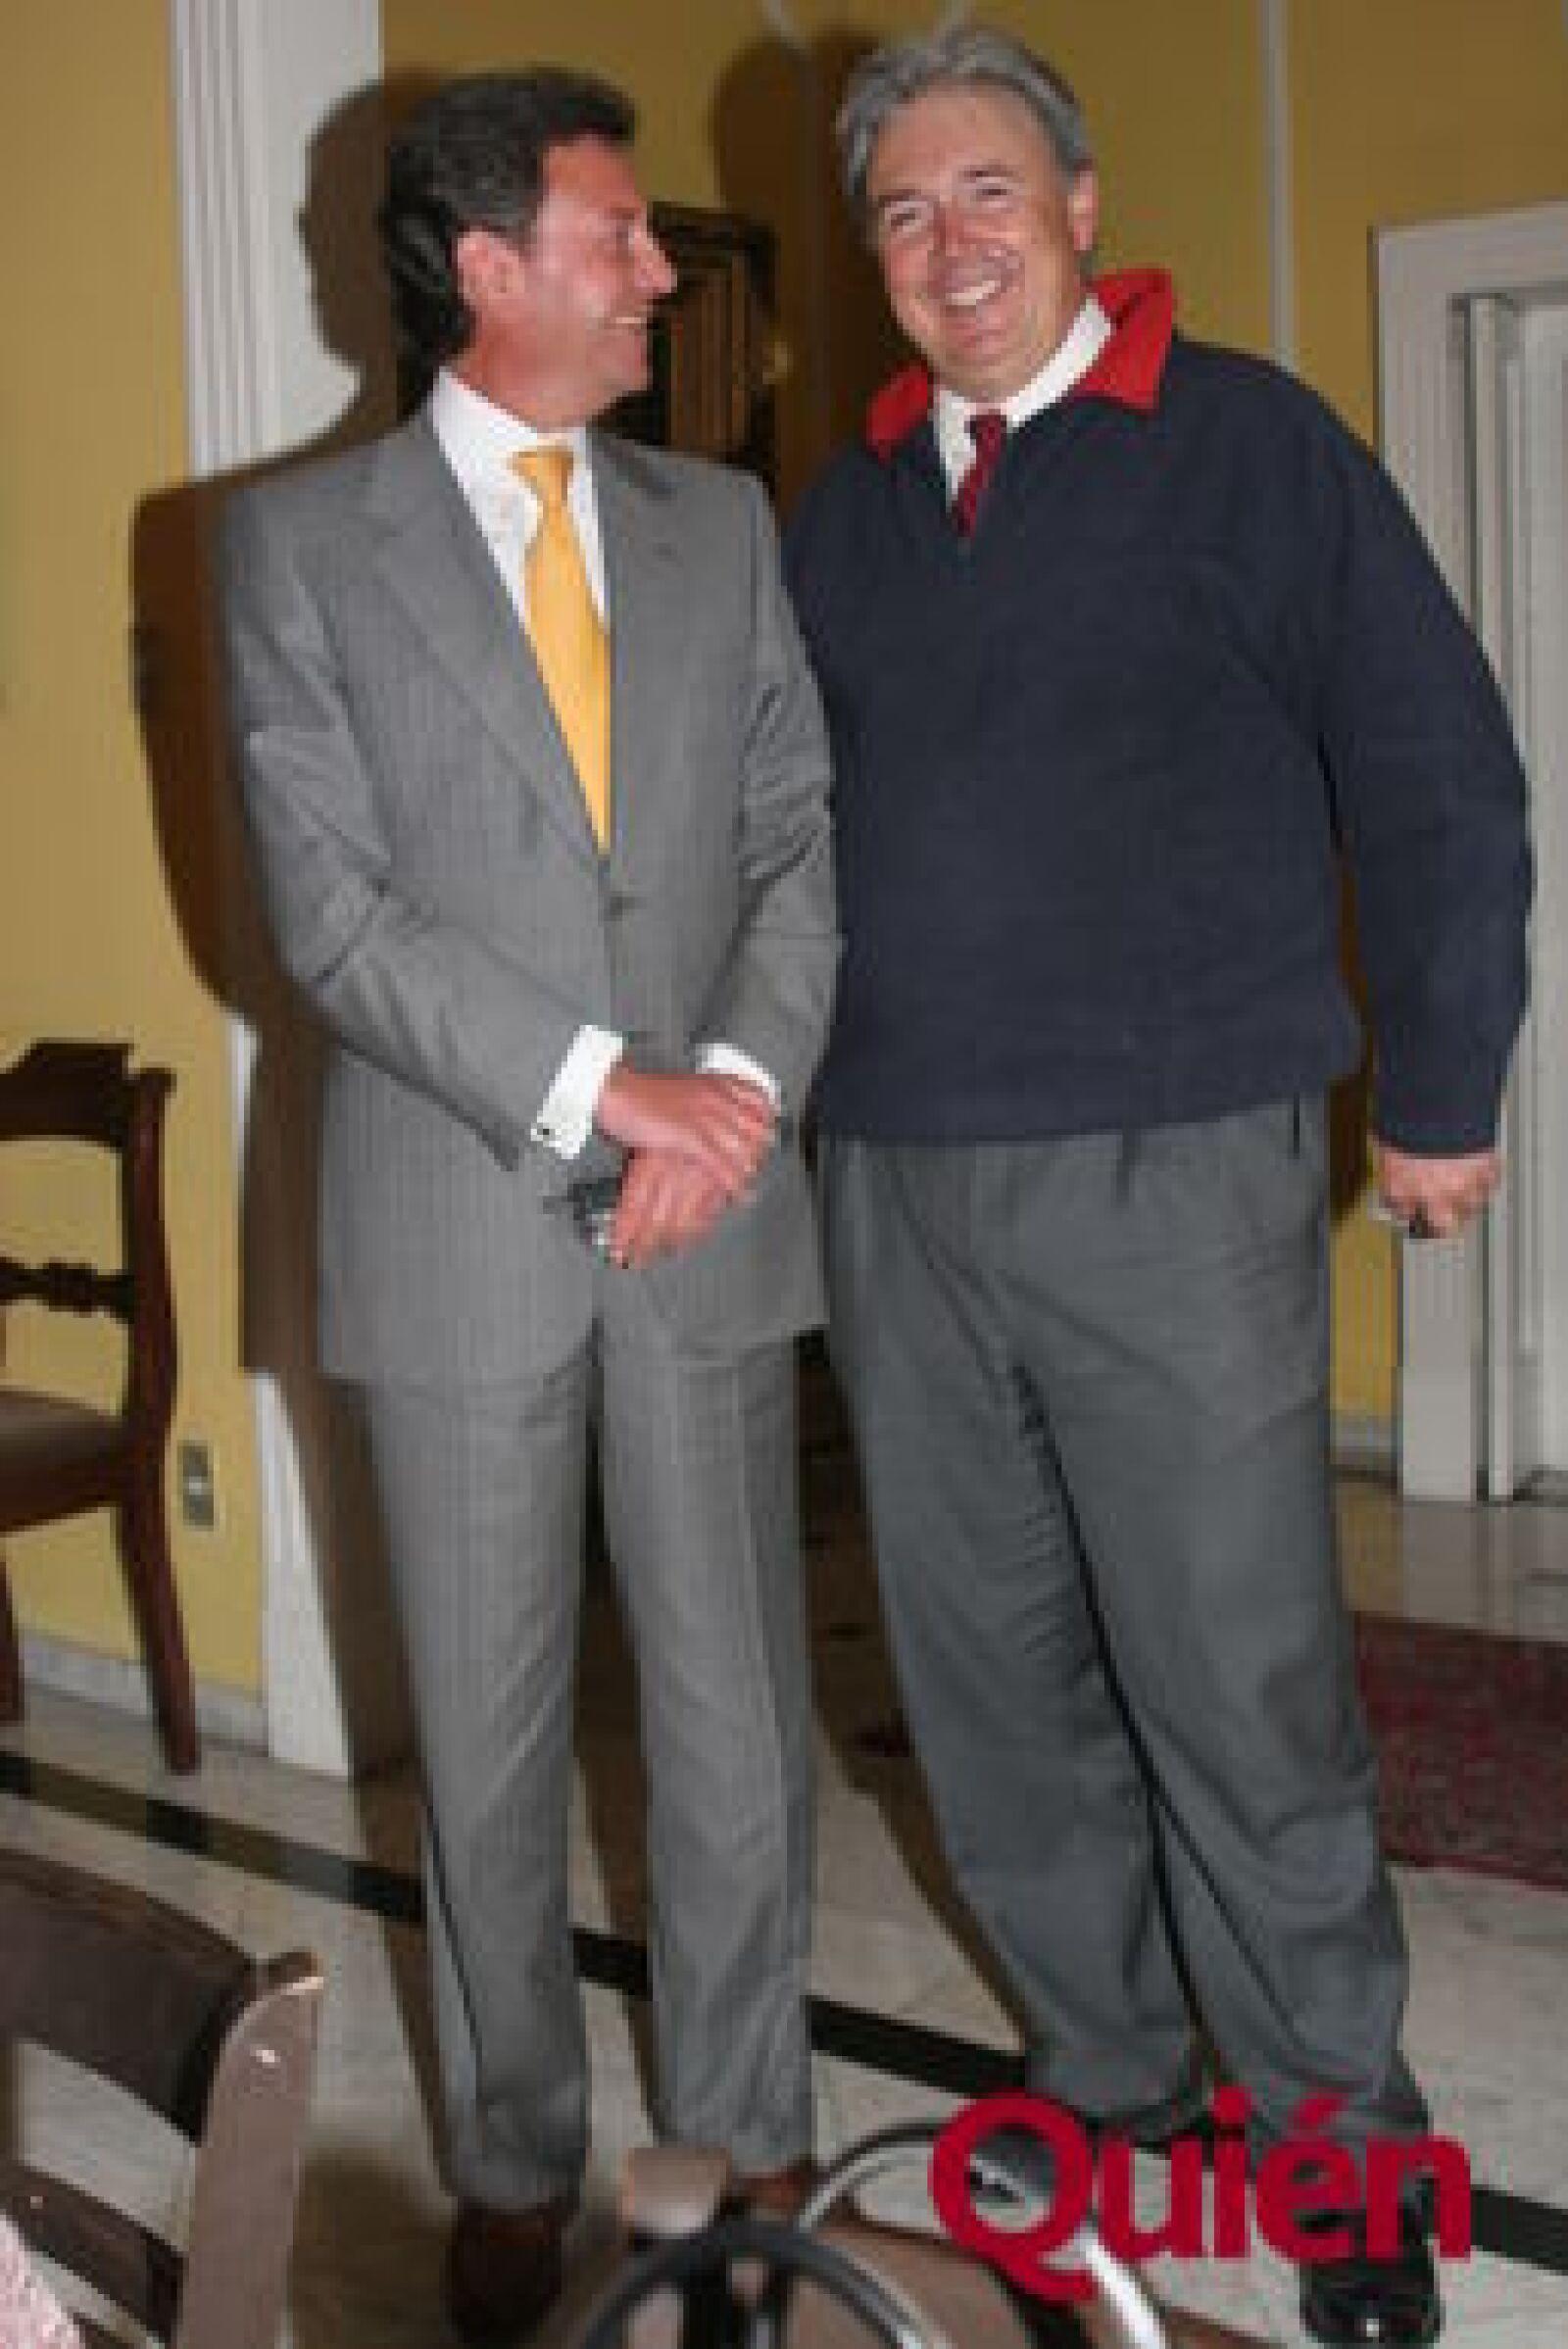 Alberto Cabezut, Luis Arredondo